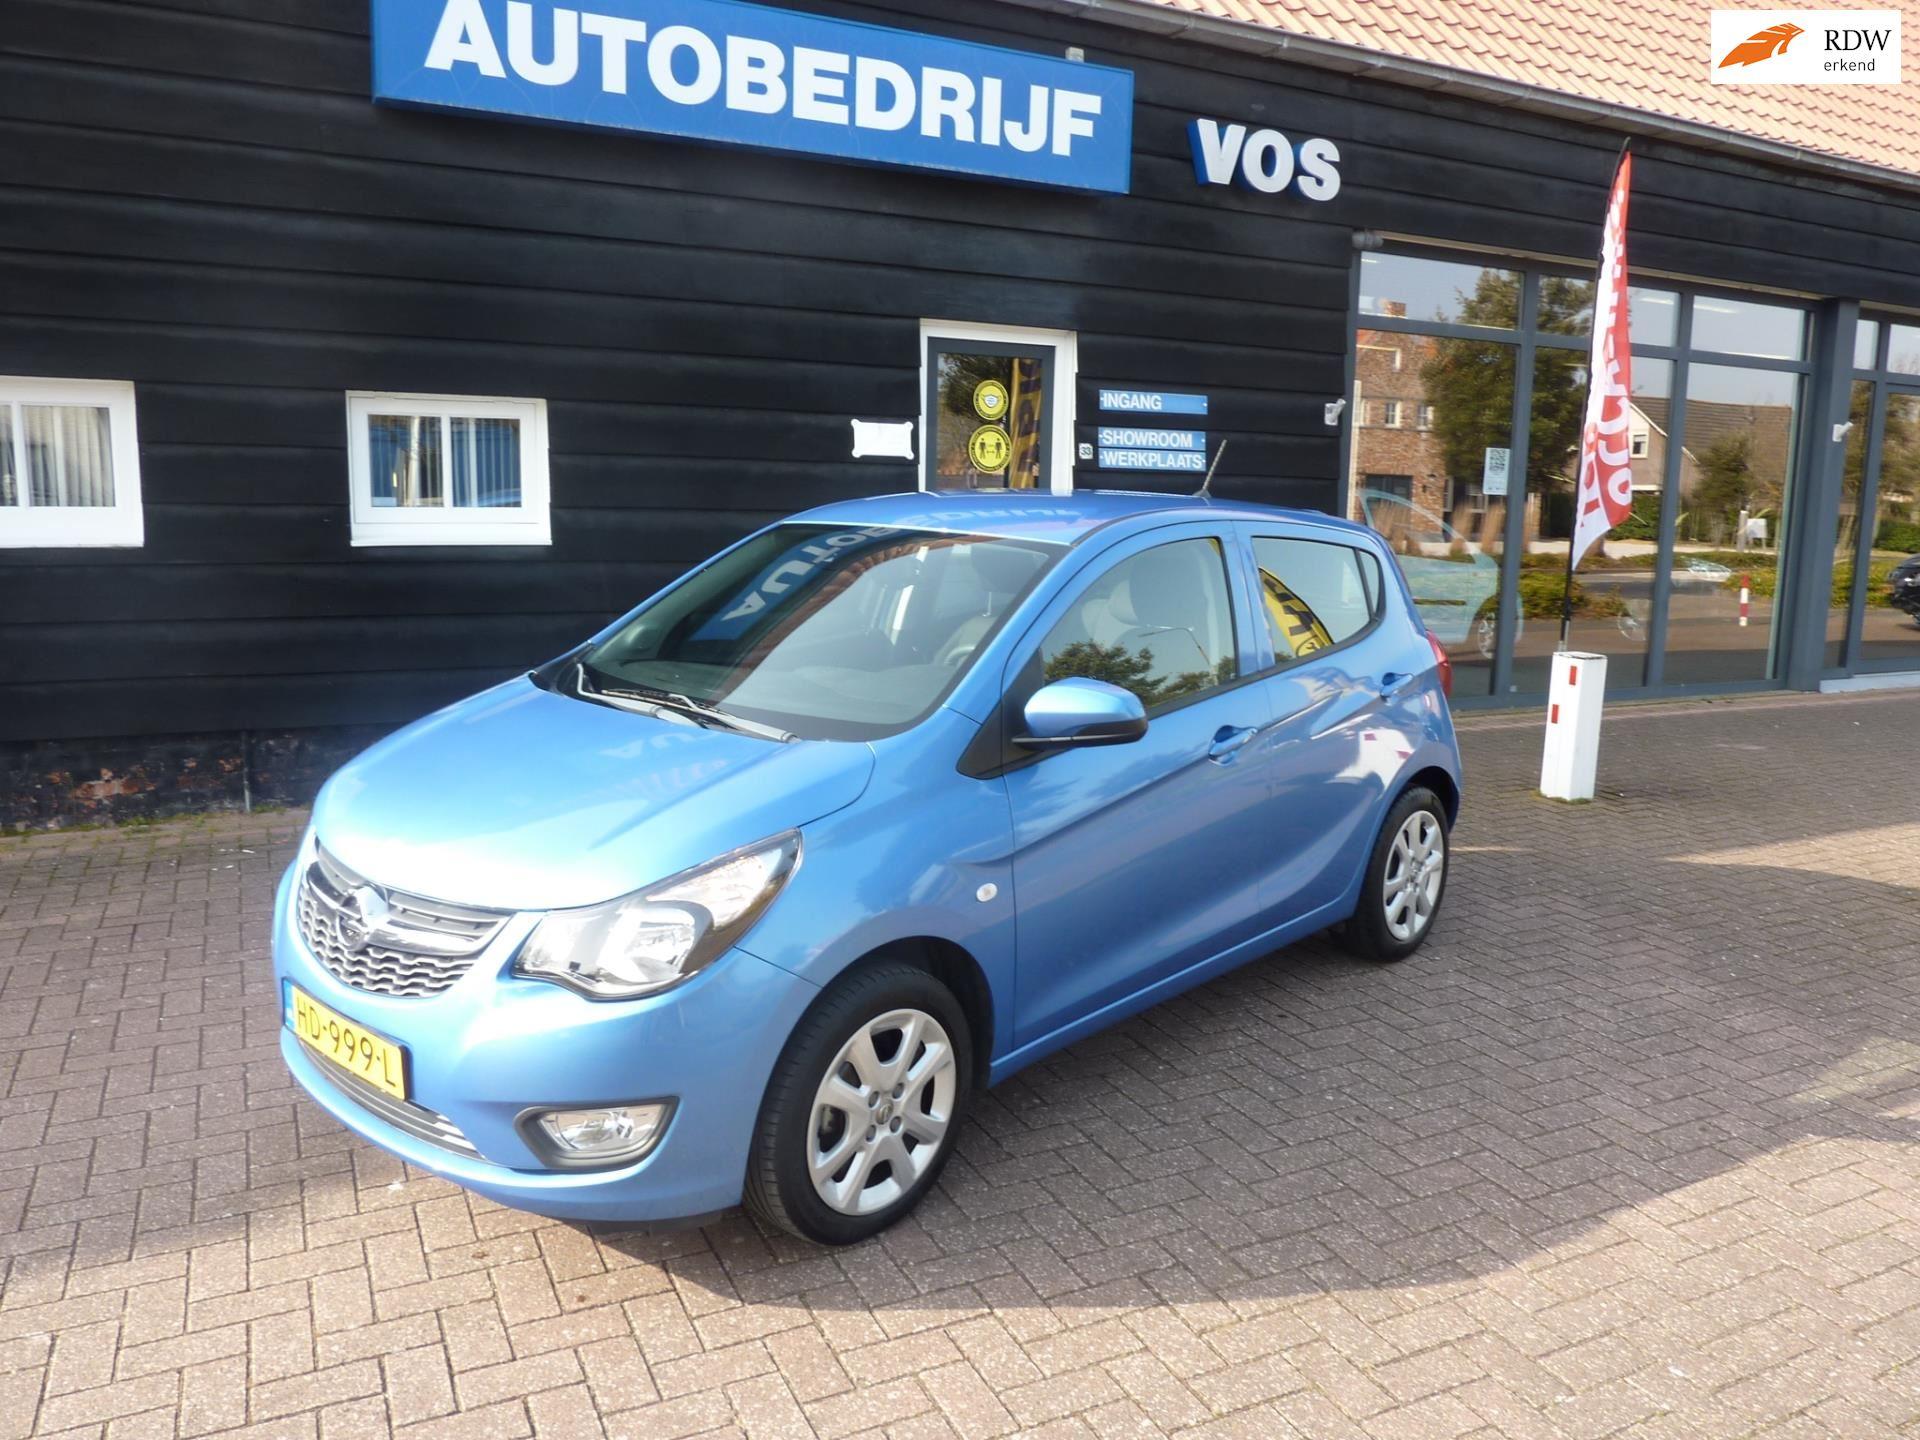 Opel KARL occasion - Autobedrijf Vos